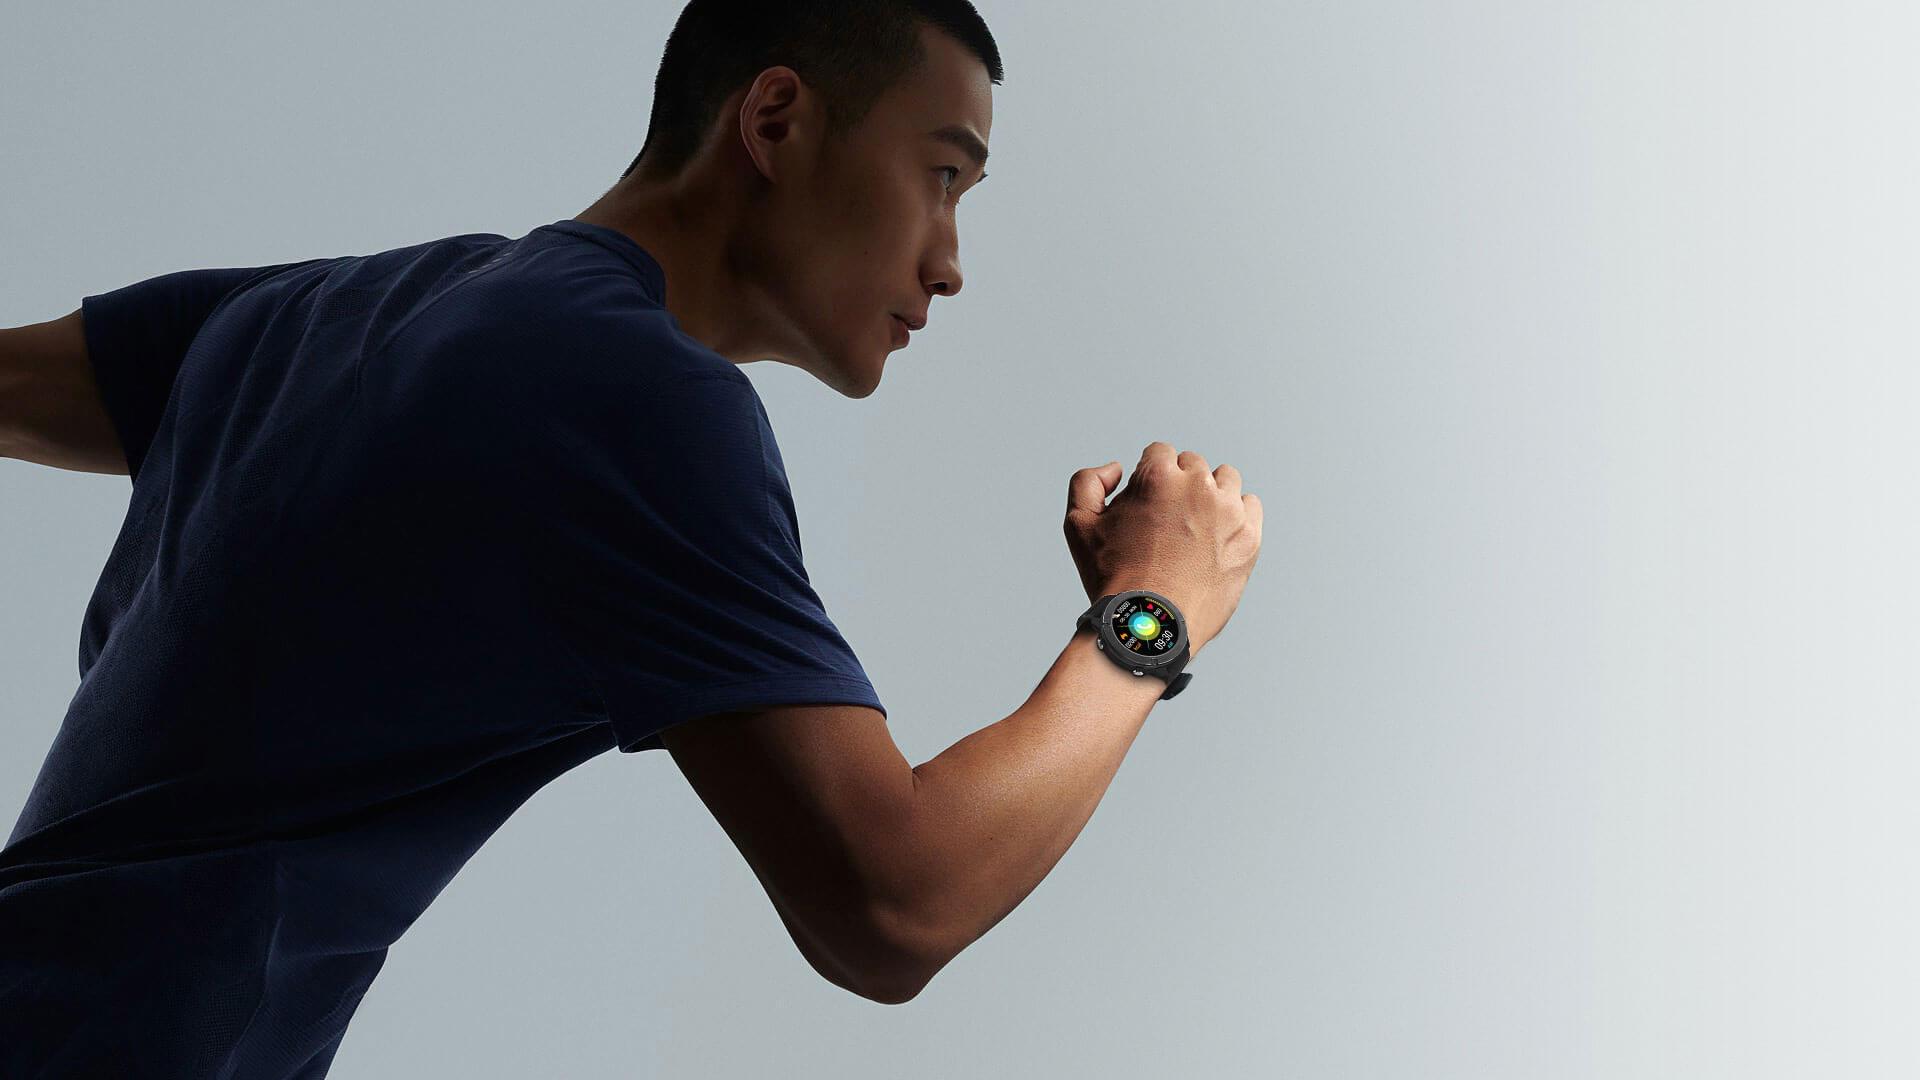 X5 Smart Watch